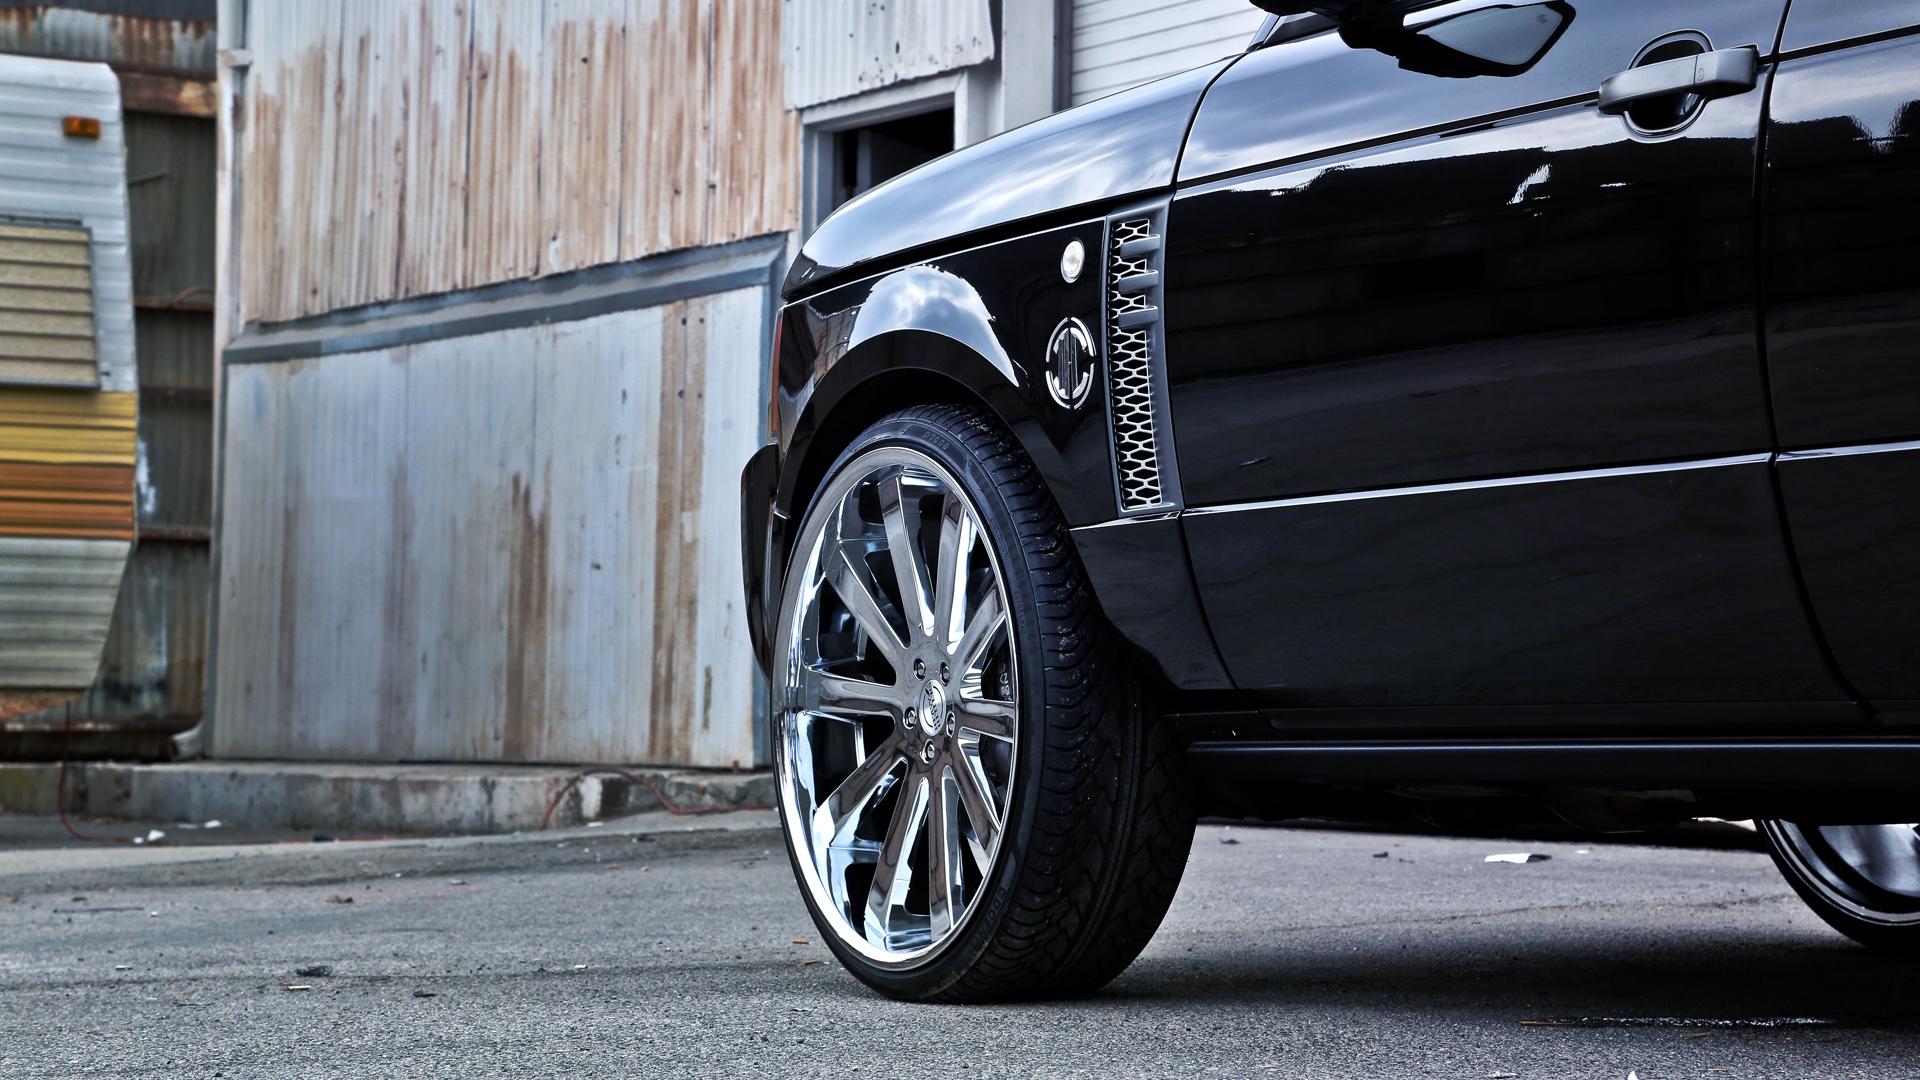 2011 Land Rover Range Rover Hh10 Heavy Hitter Wheels